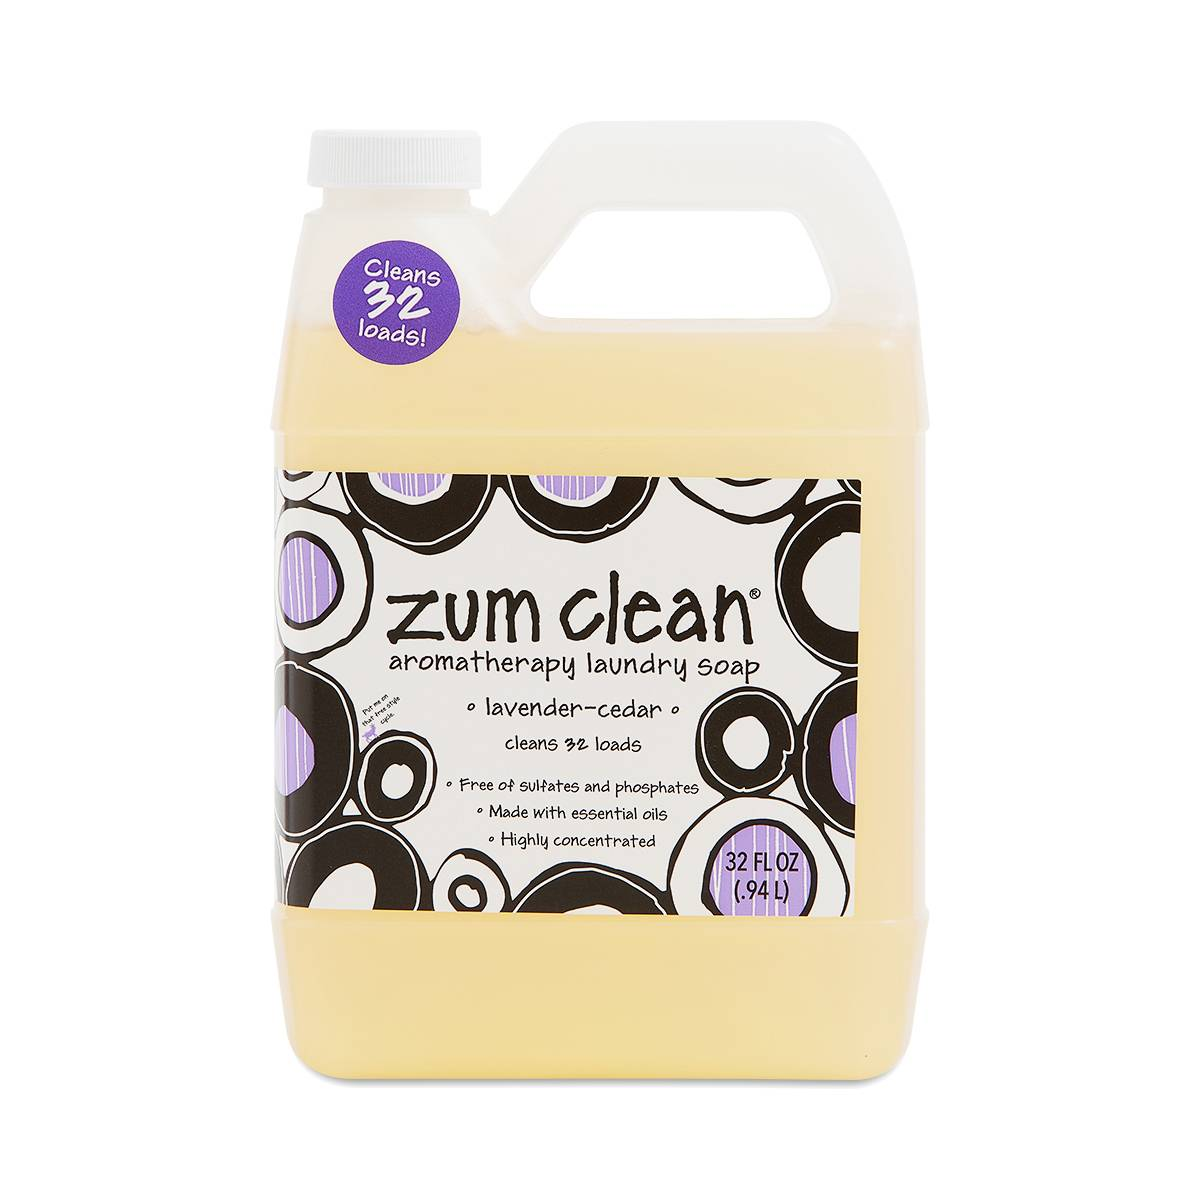 Indigo Wild Zum Clean Laundry Soap Lavender Cedar